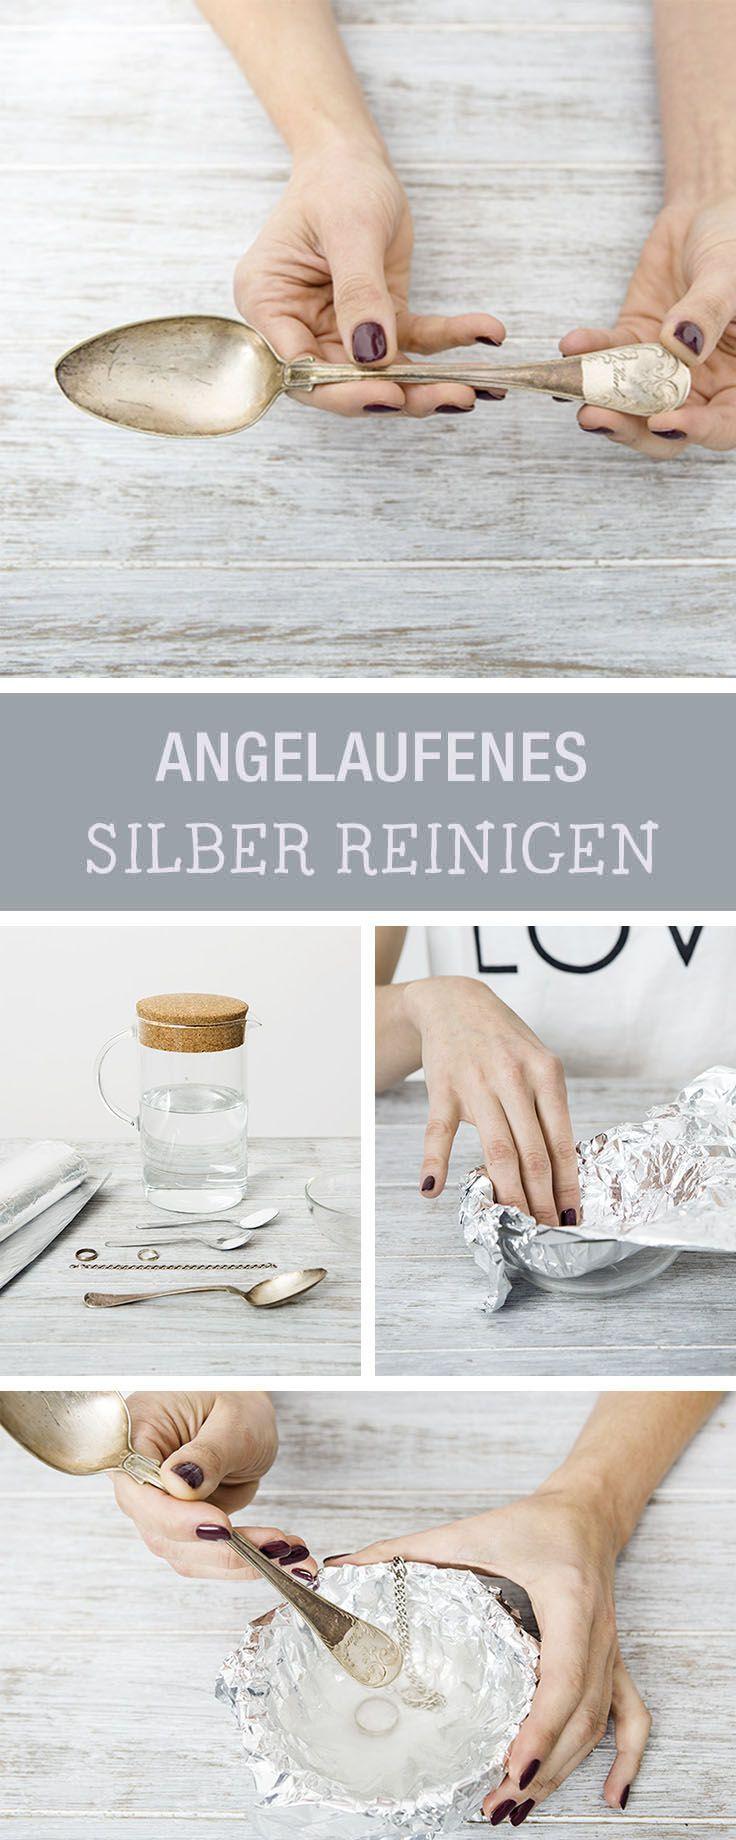 Haushaltstipp: Angelaufenes Silber reinigen, Besteck reinigen / how to bring back the natural shine of tarnished silver via DaWanda.com